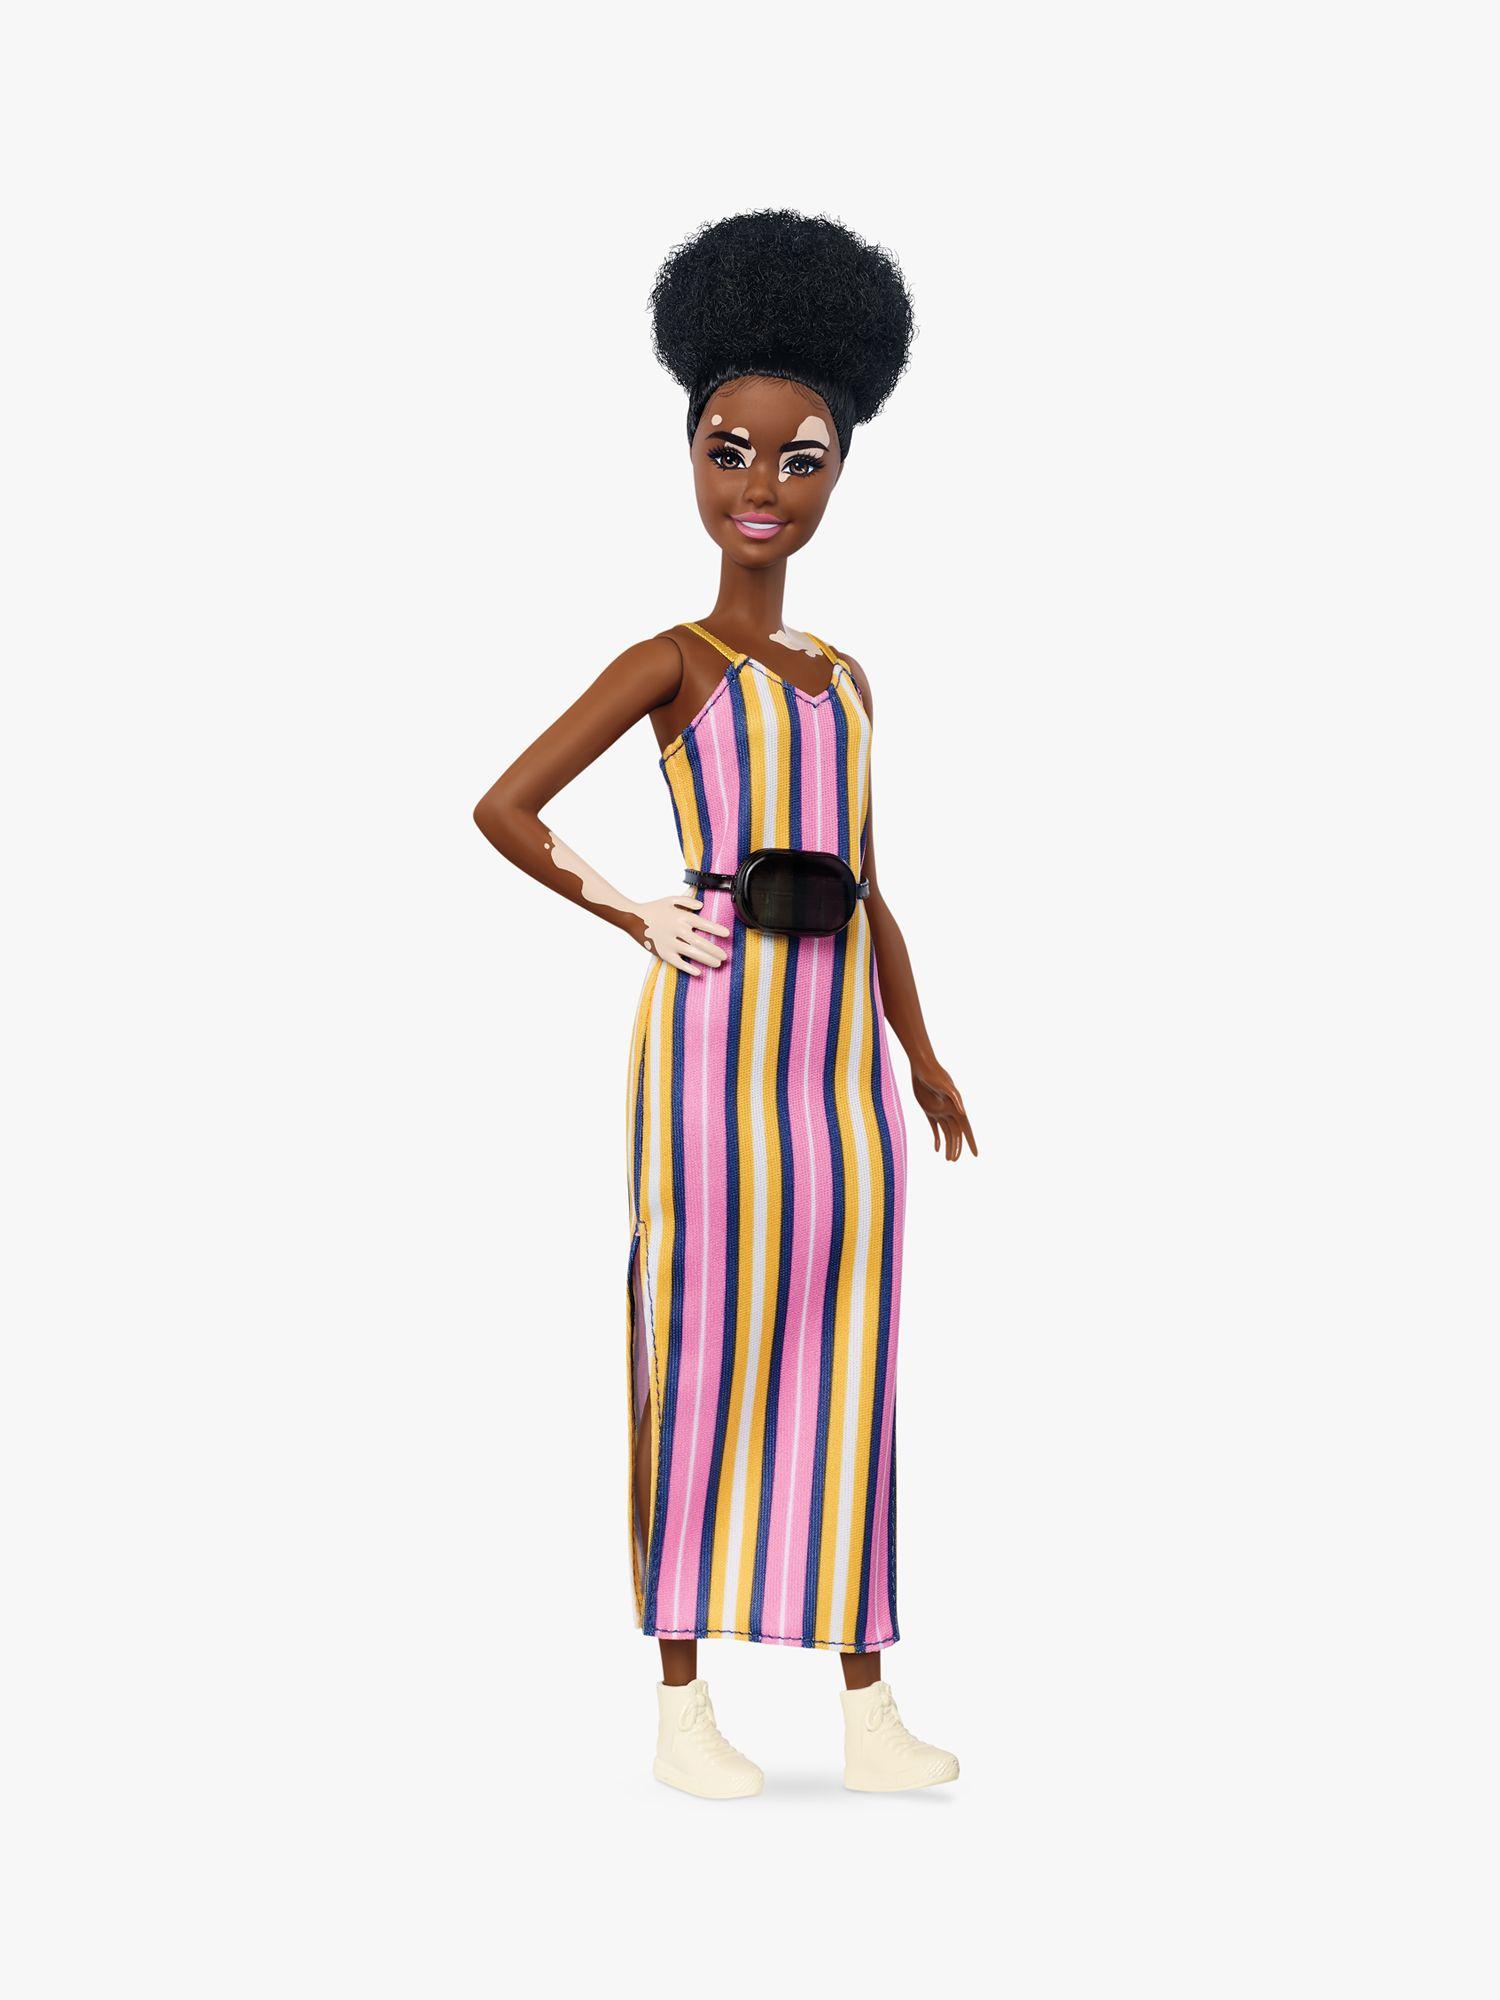 Barbie Barbie Fashionistas Vitiligo Doll